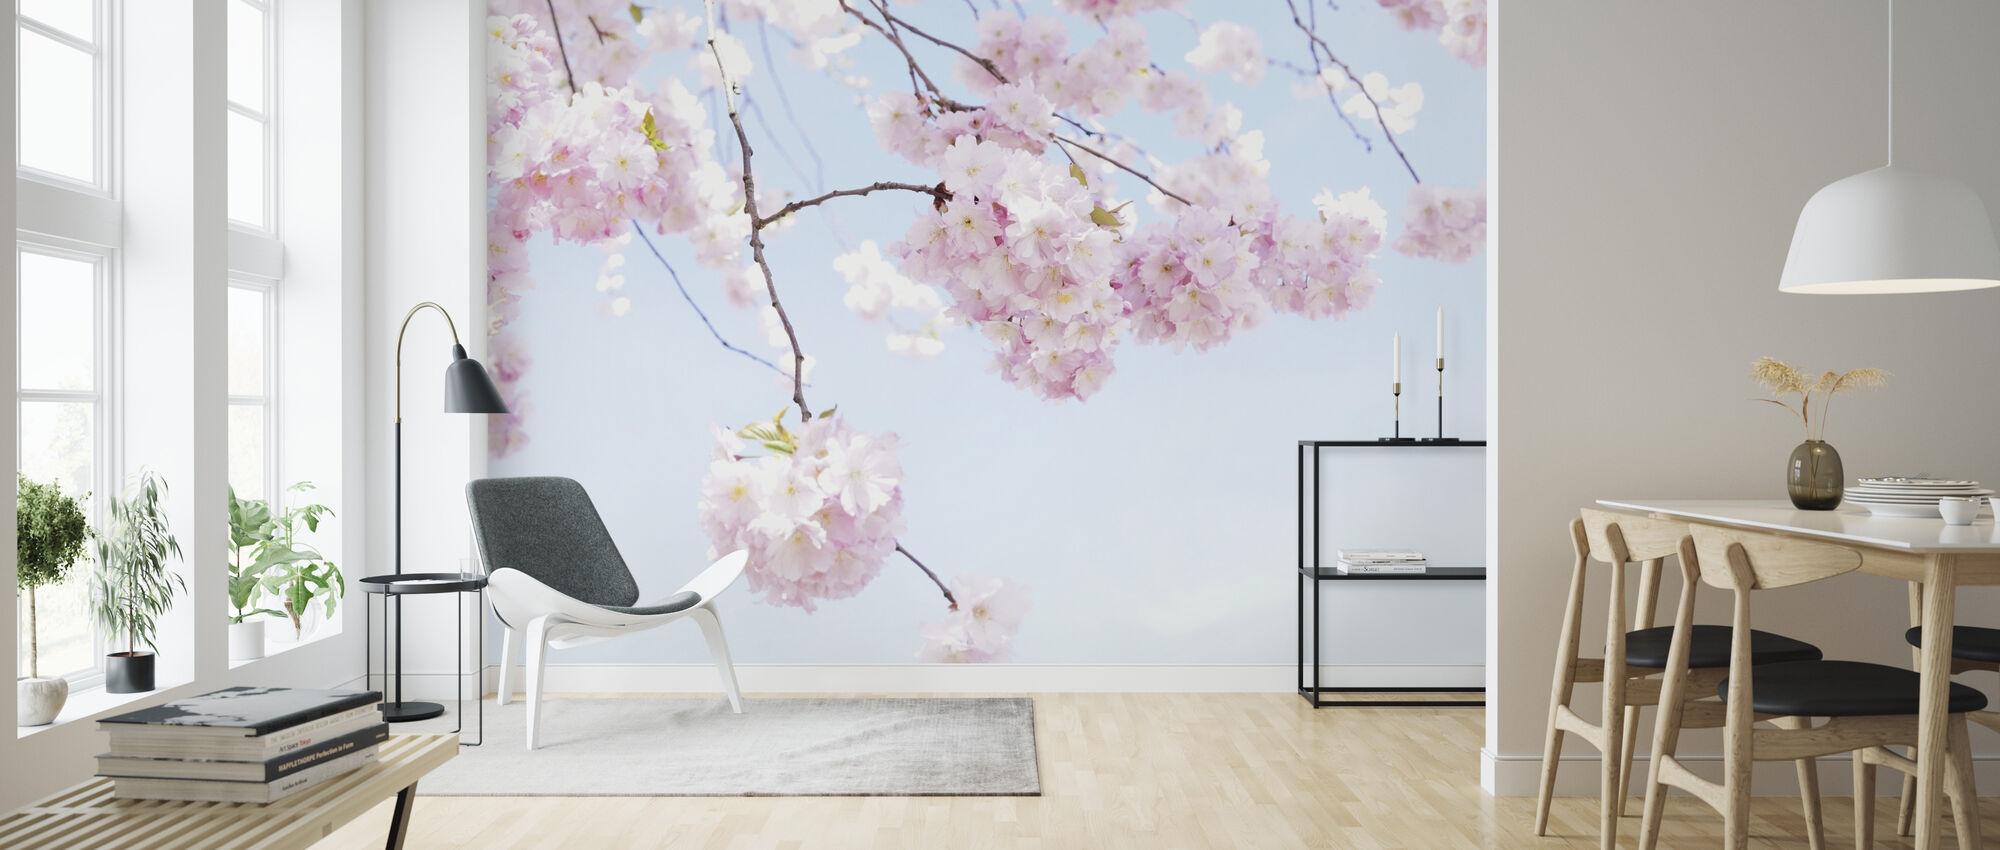 Blooming Cherry Flowers - Wallpaper - Living Room